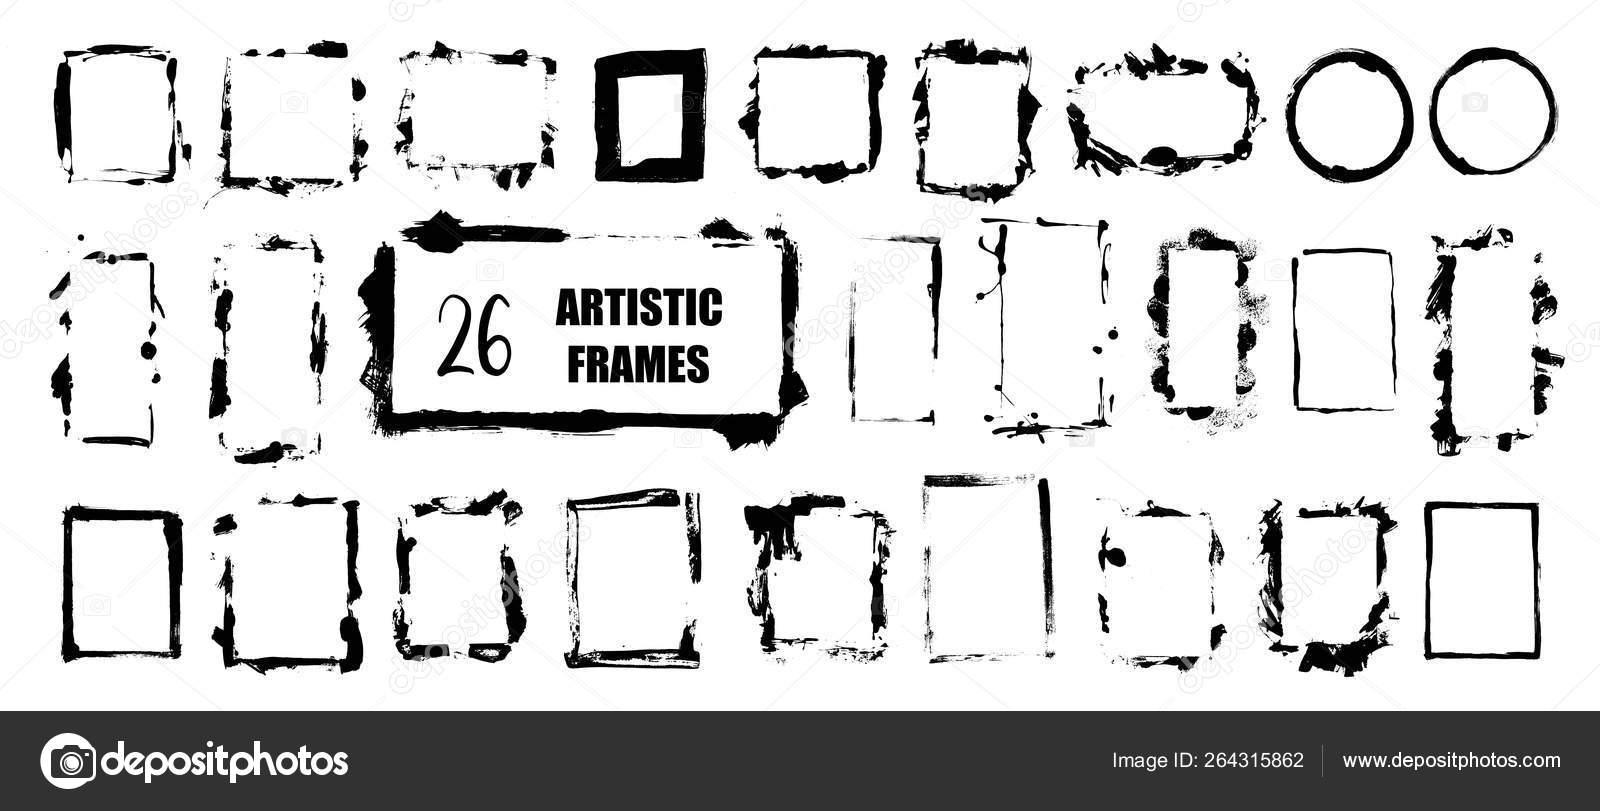 Set Hand Drawn Artistic Frames Grunge Brush Stroke Frame Quote Stock Vector C Olga C 264315862